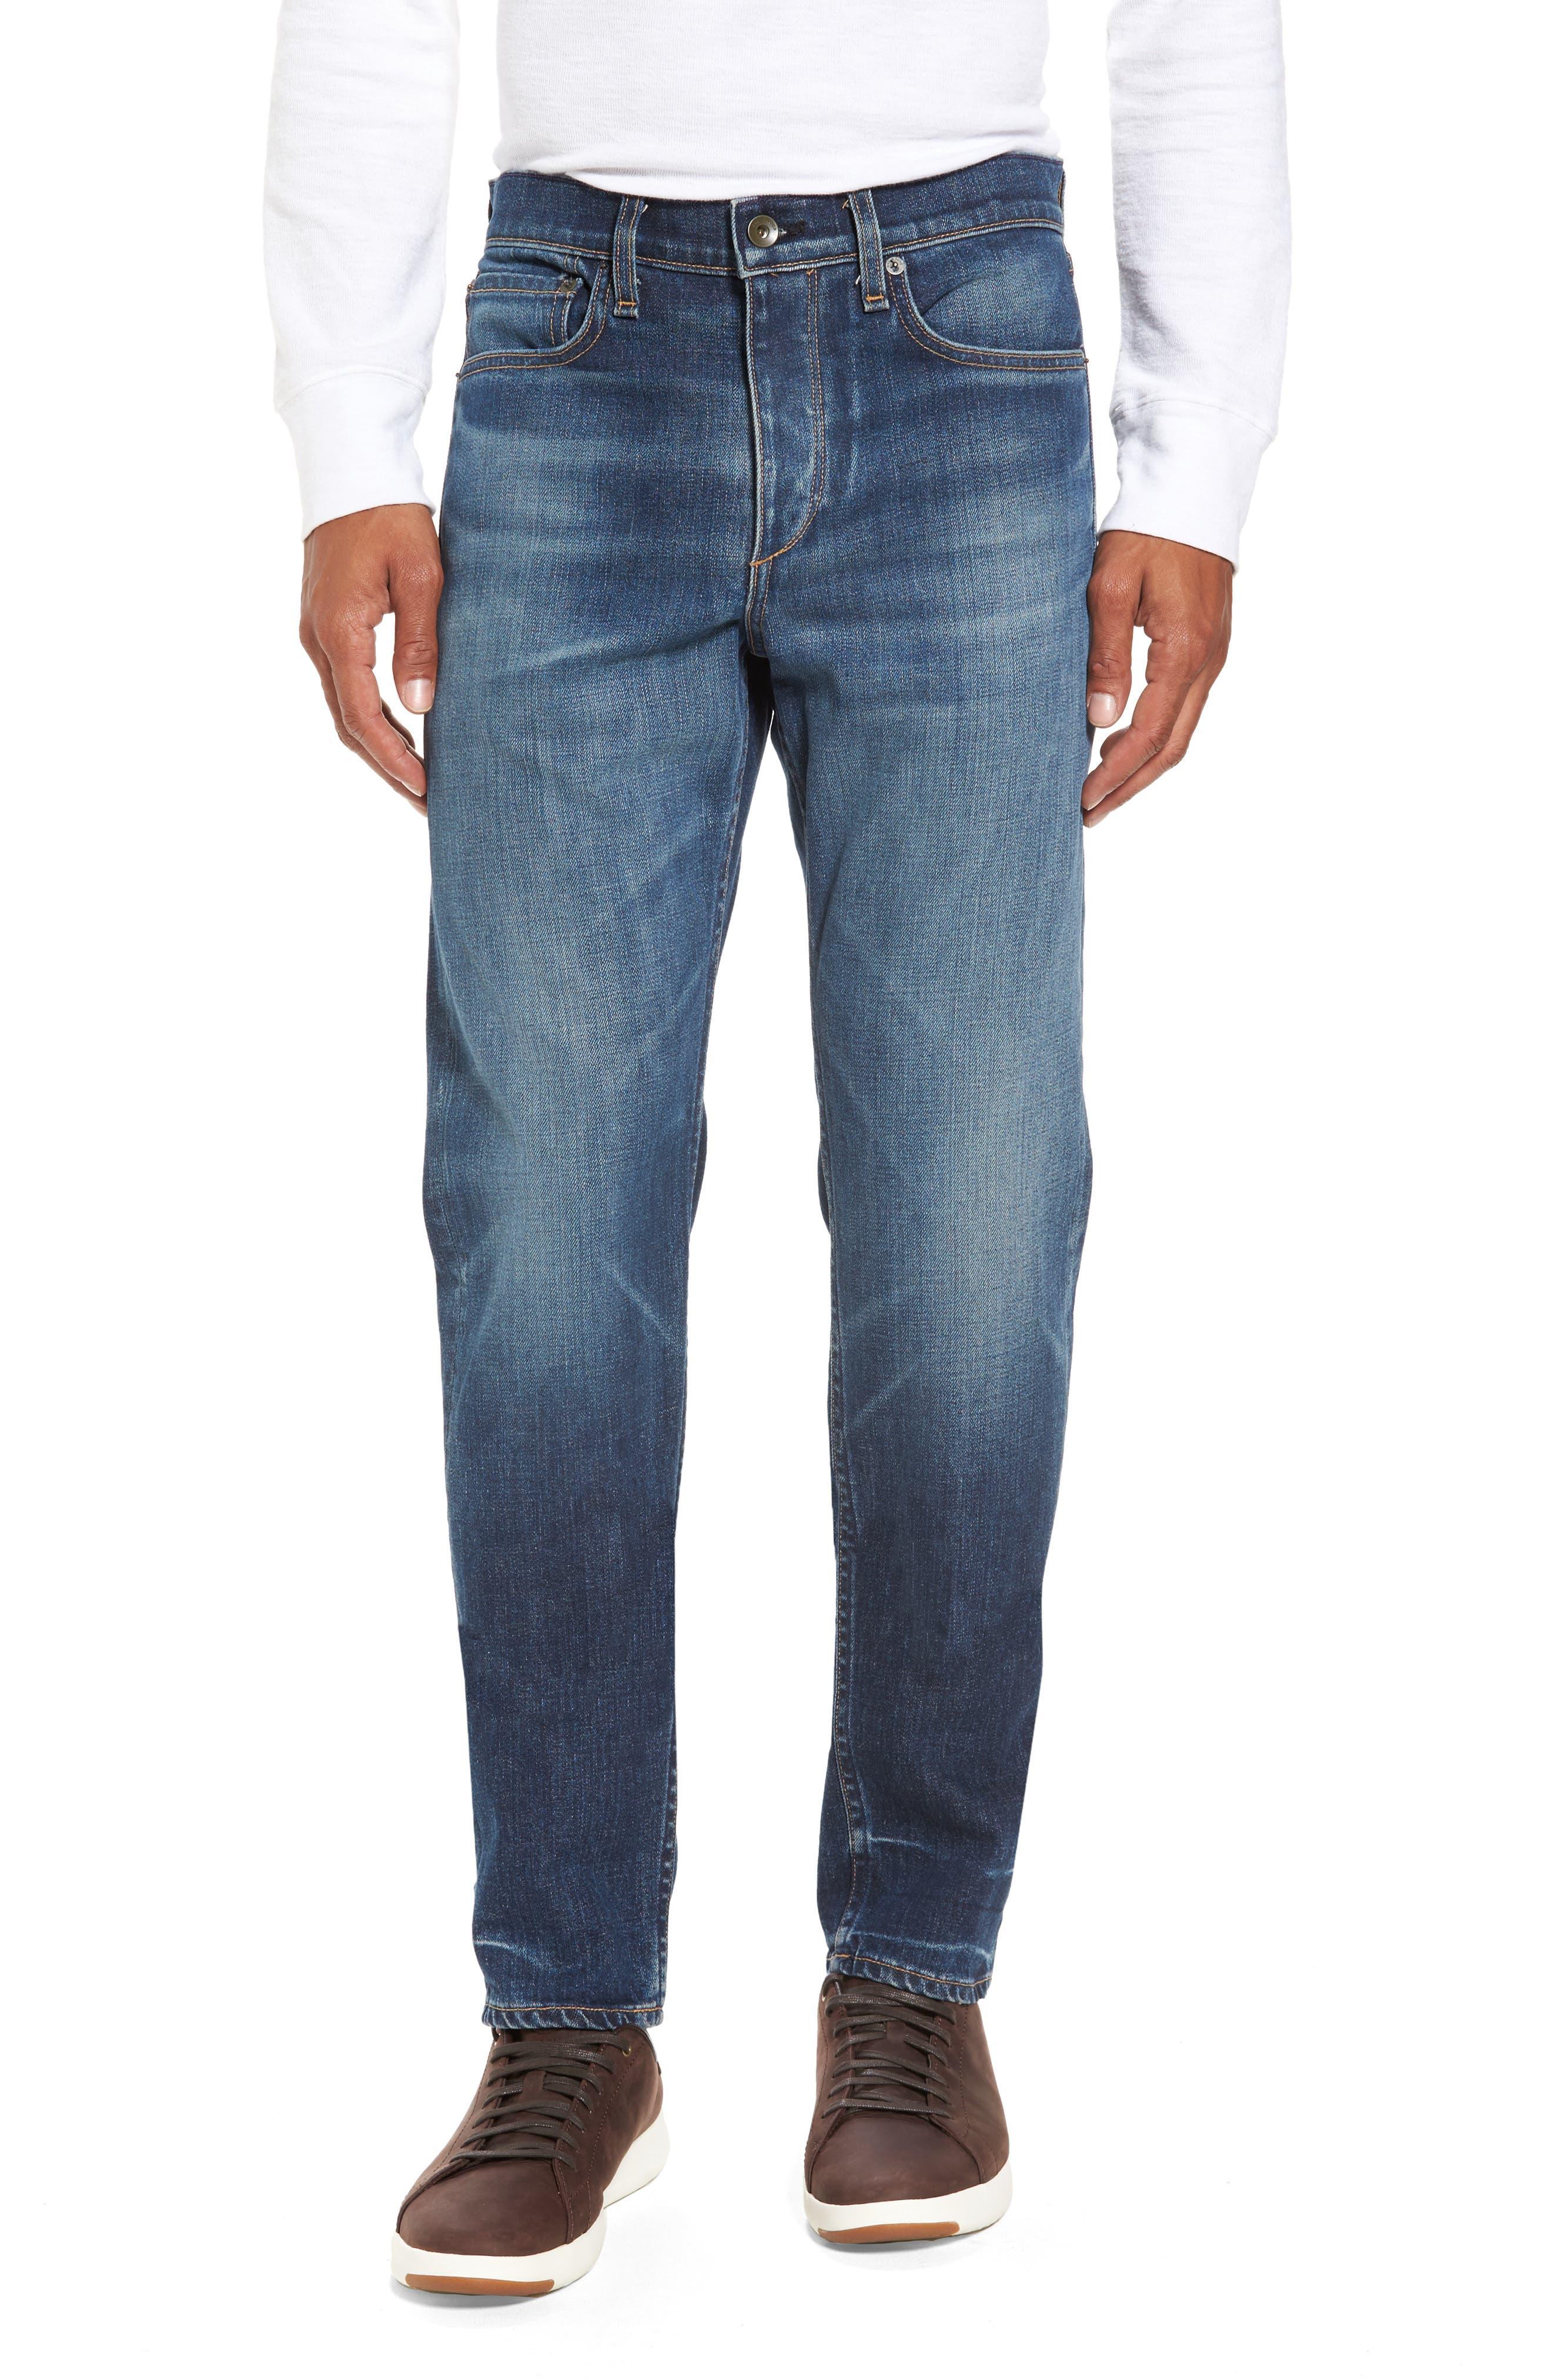 Main Image - rag & bone Fit 2 Slim Fit Jeans (Linden)